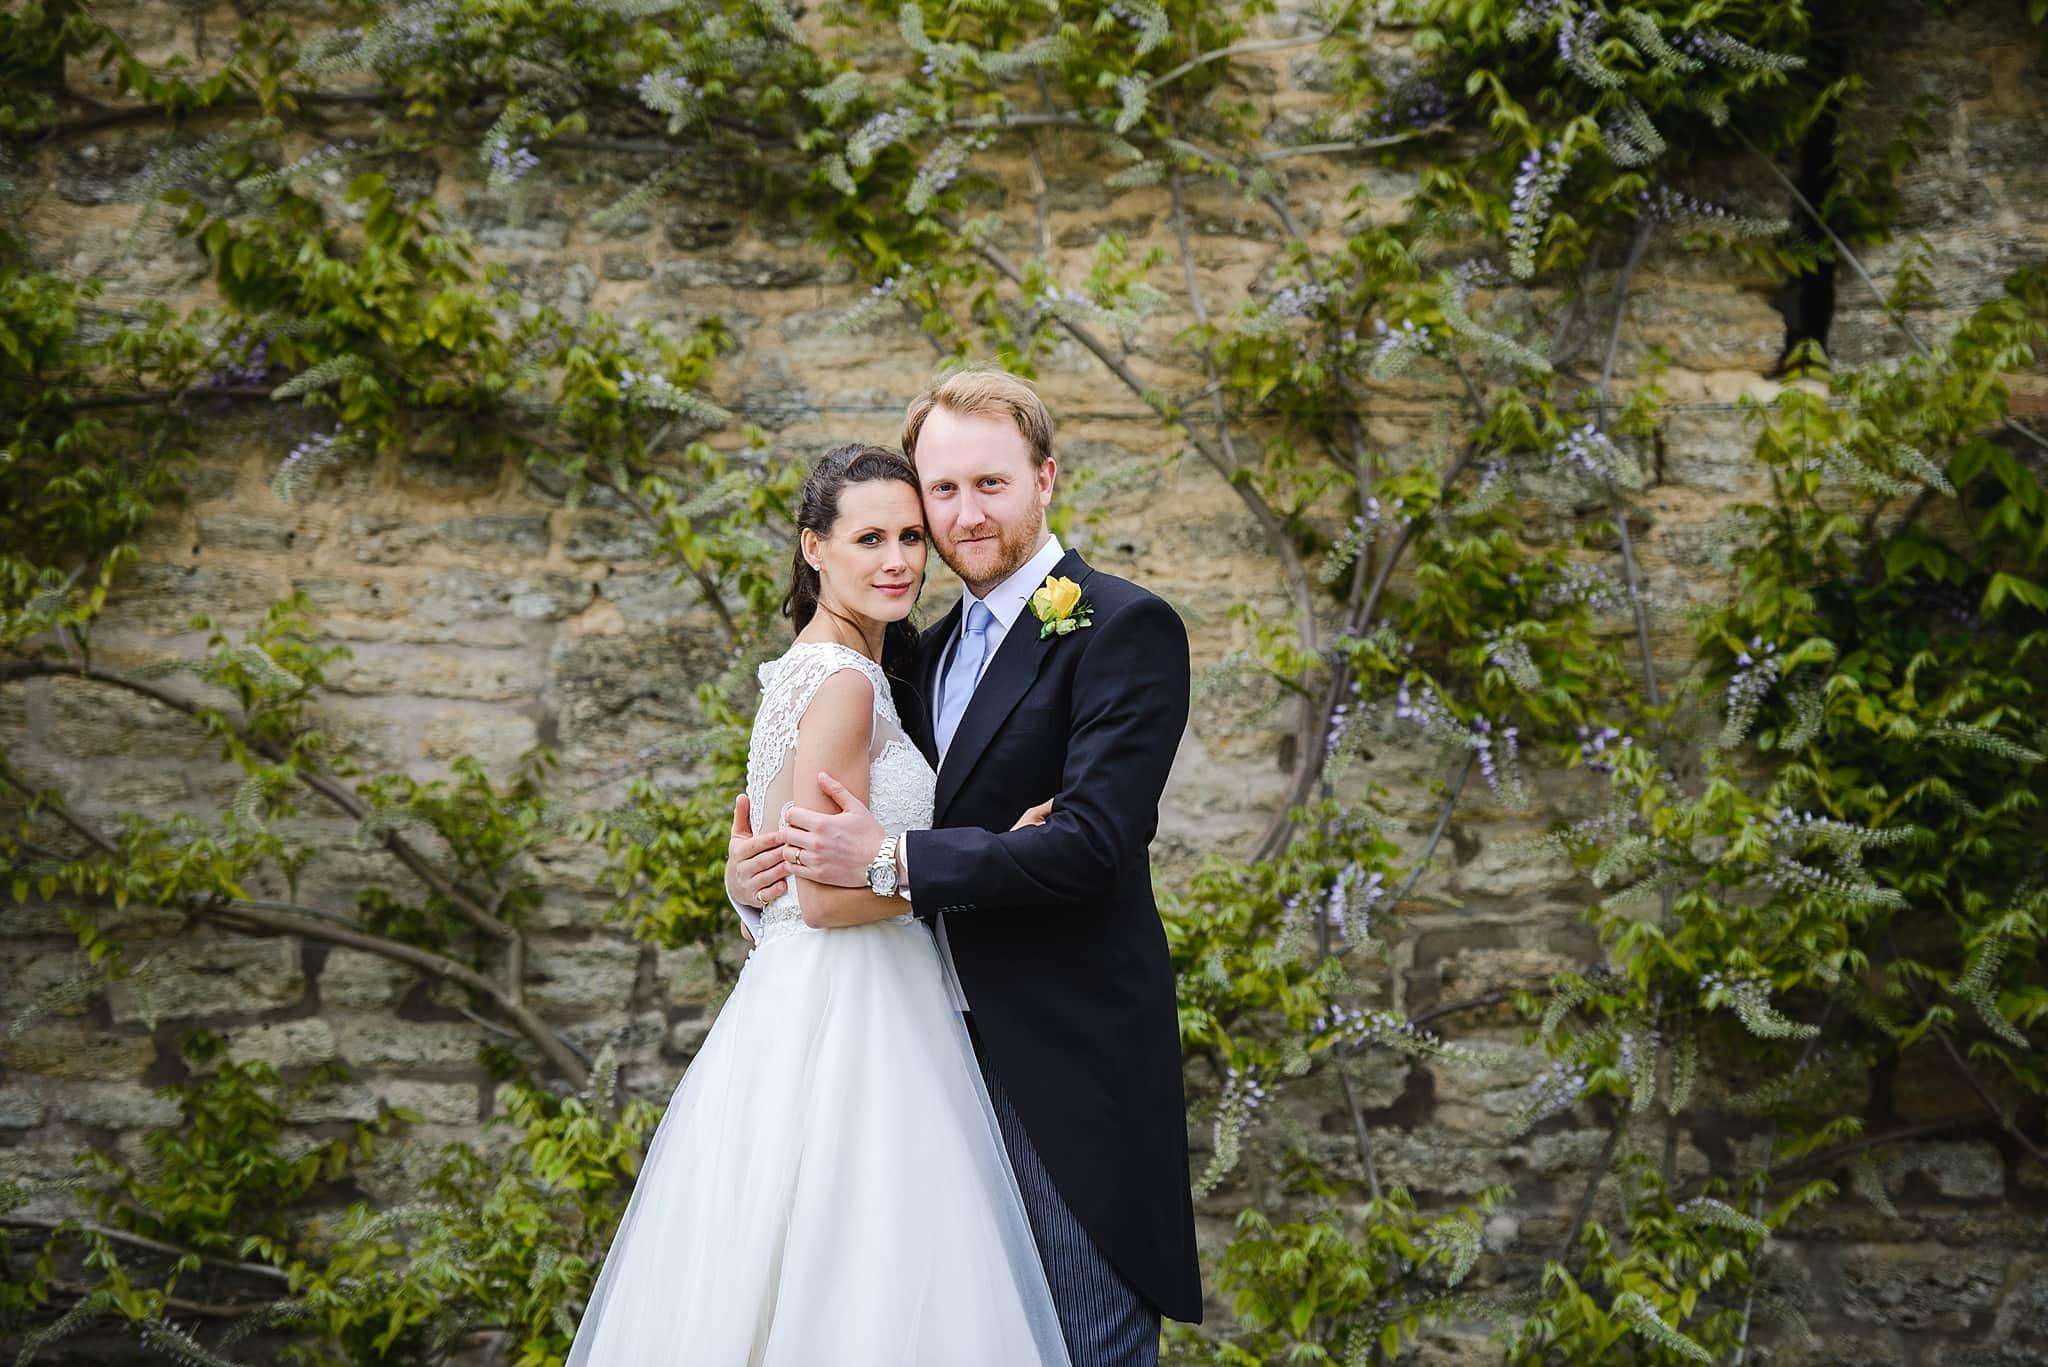 A couple have photos on their wedding day